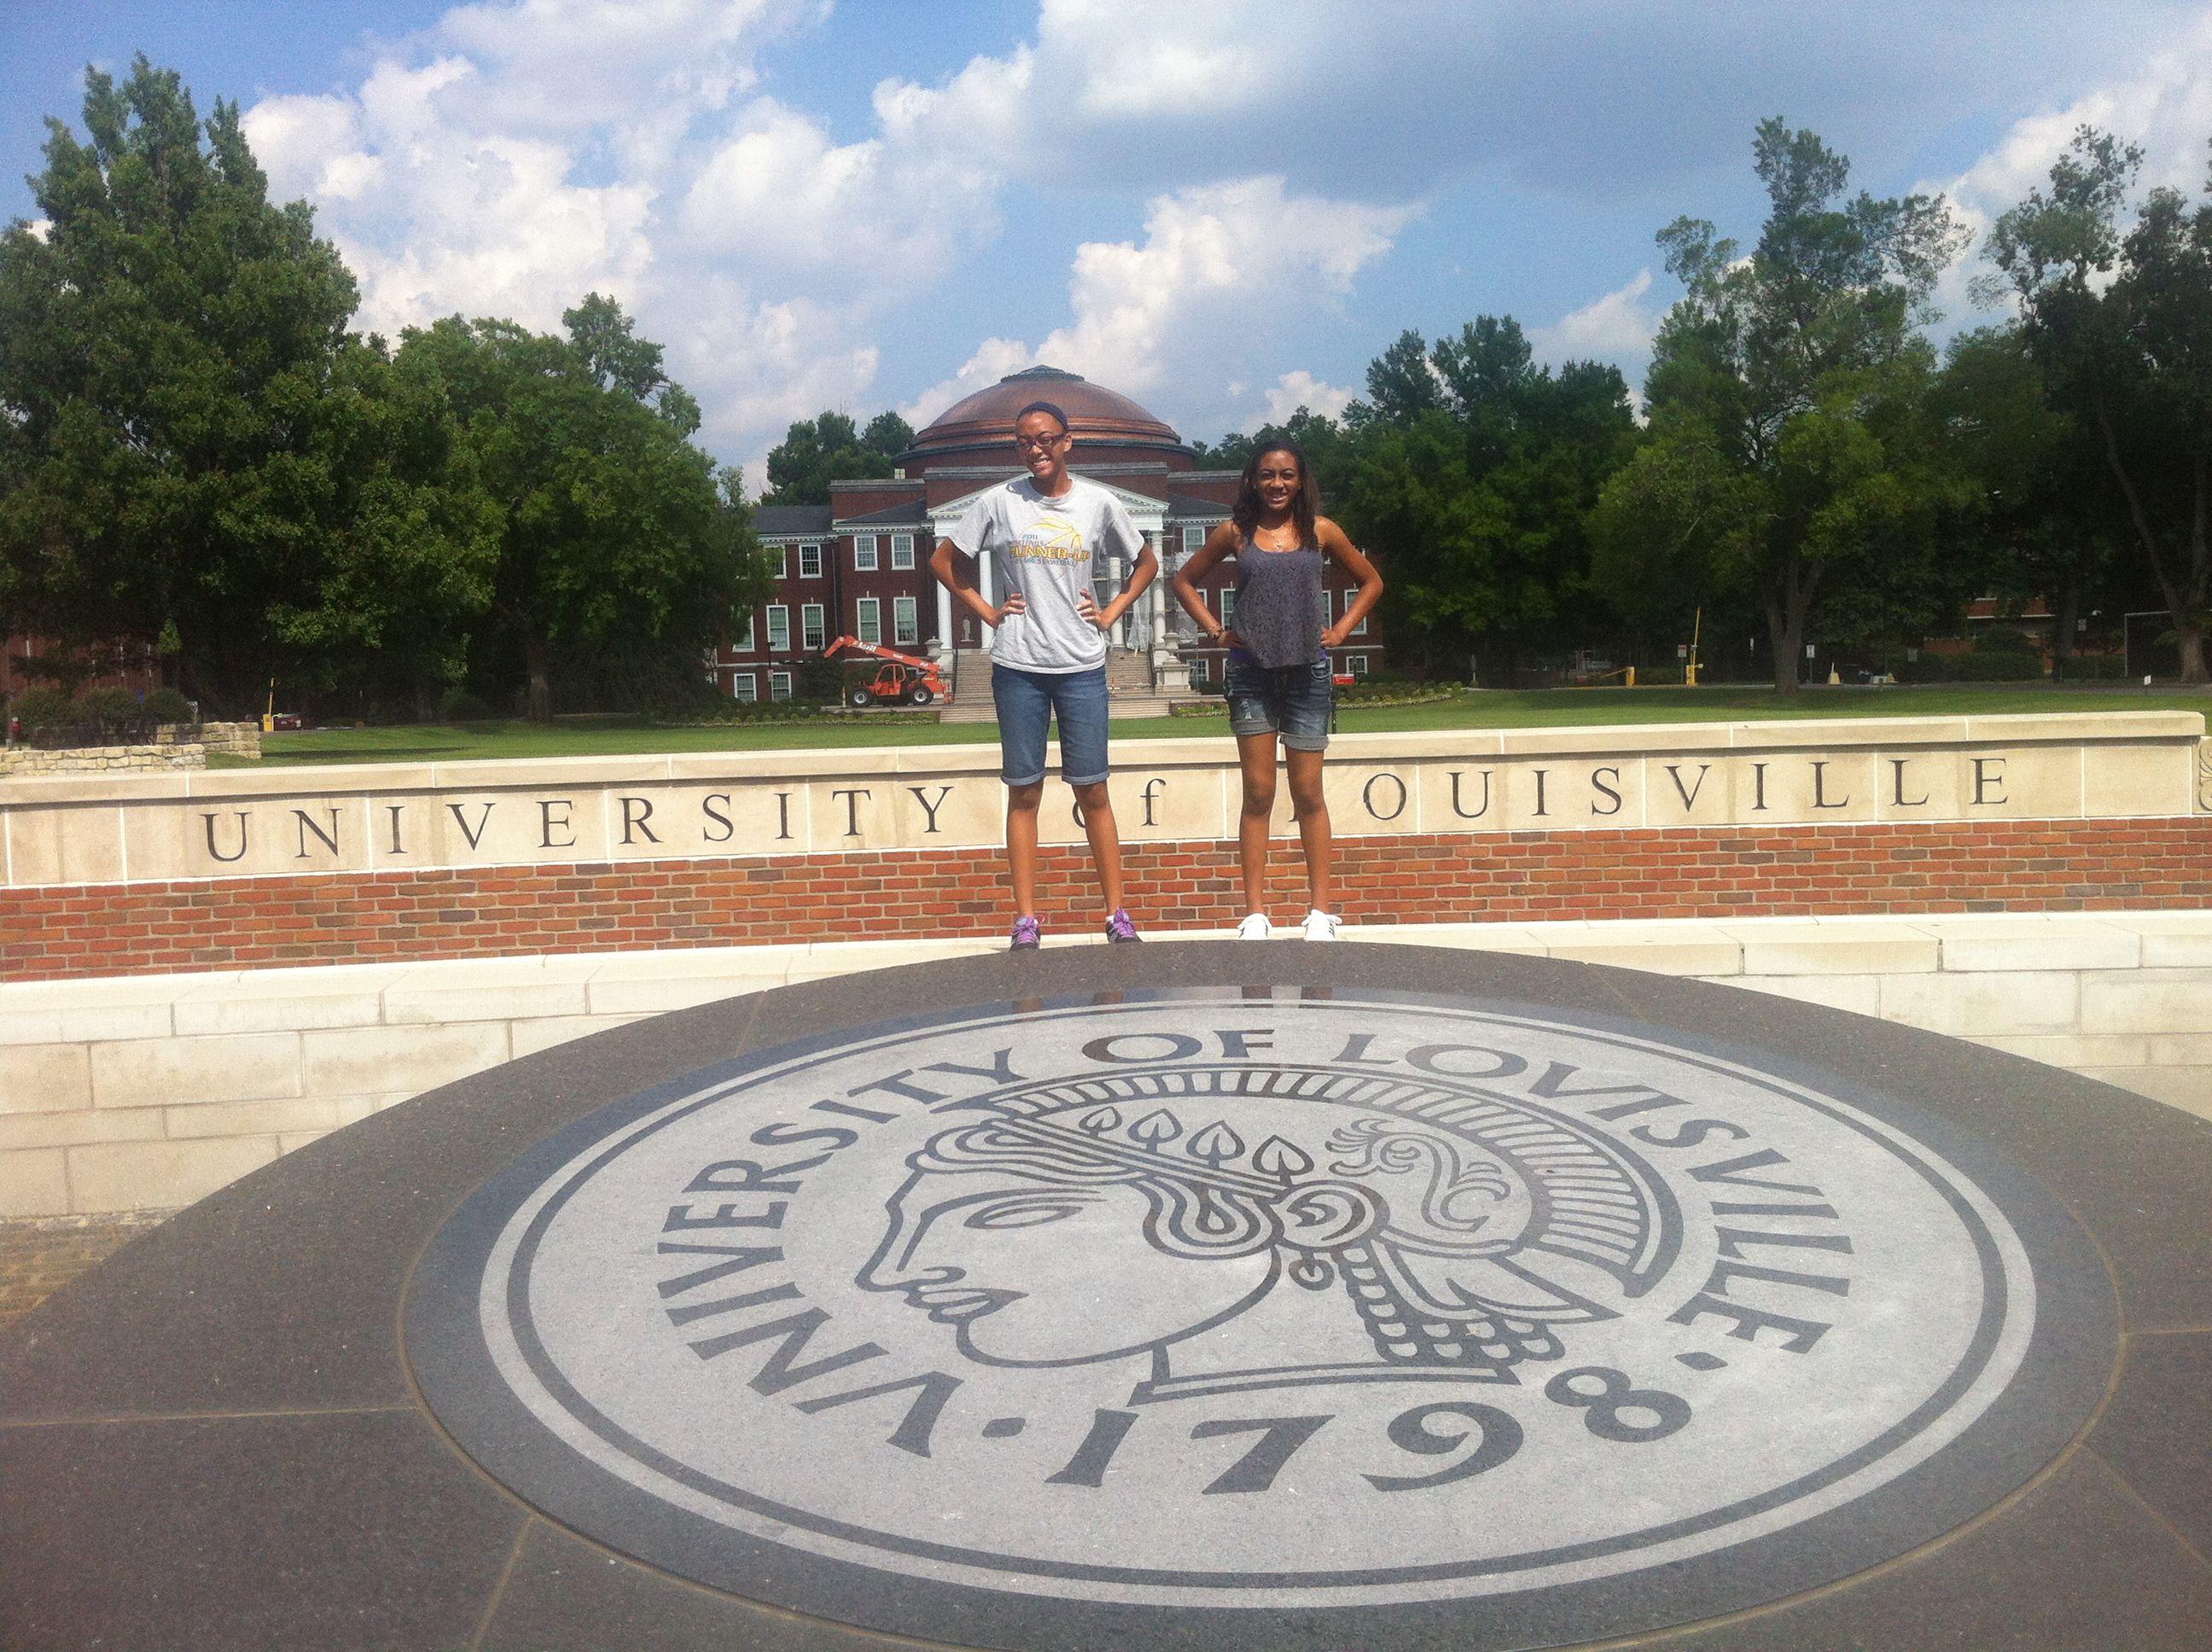 06.22.13 Univ of Louisville visit